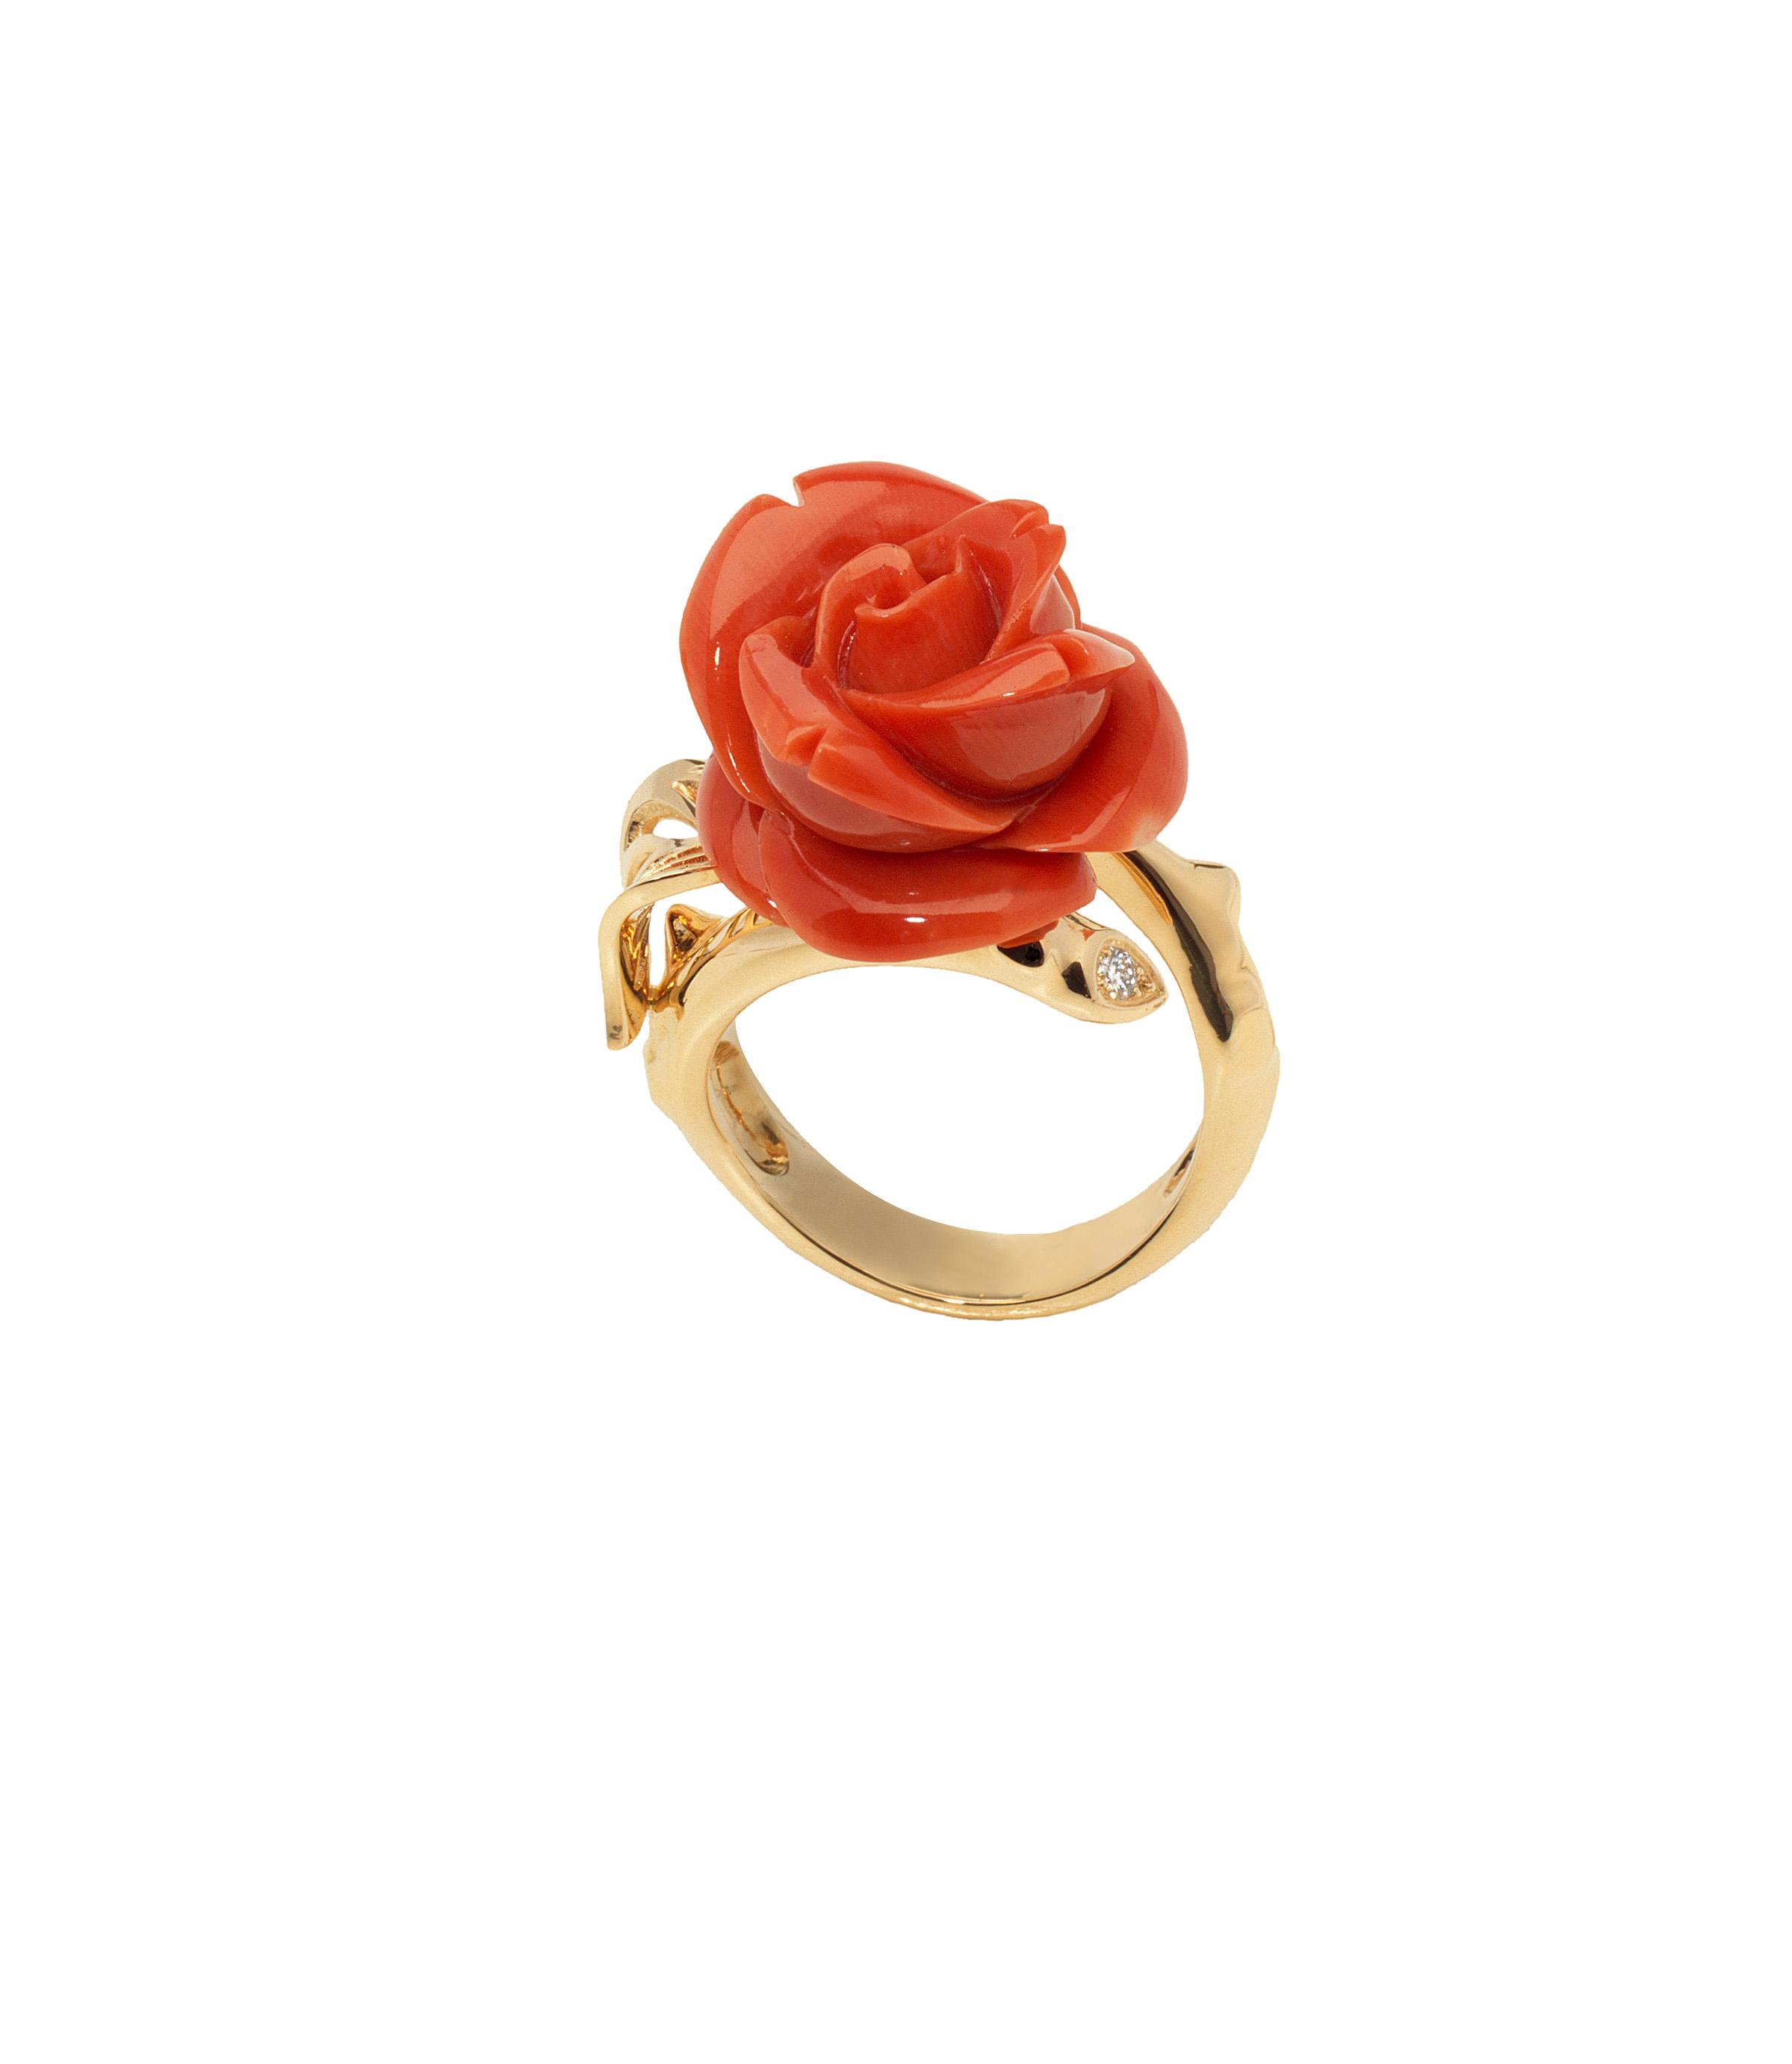 bague rose dior pr catelan corail rouge pm luxsure. Black Bedroom Furniture Sets. Home Design Ideas